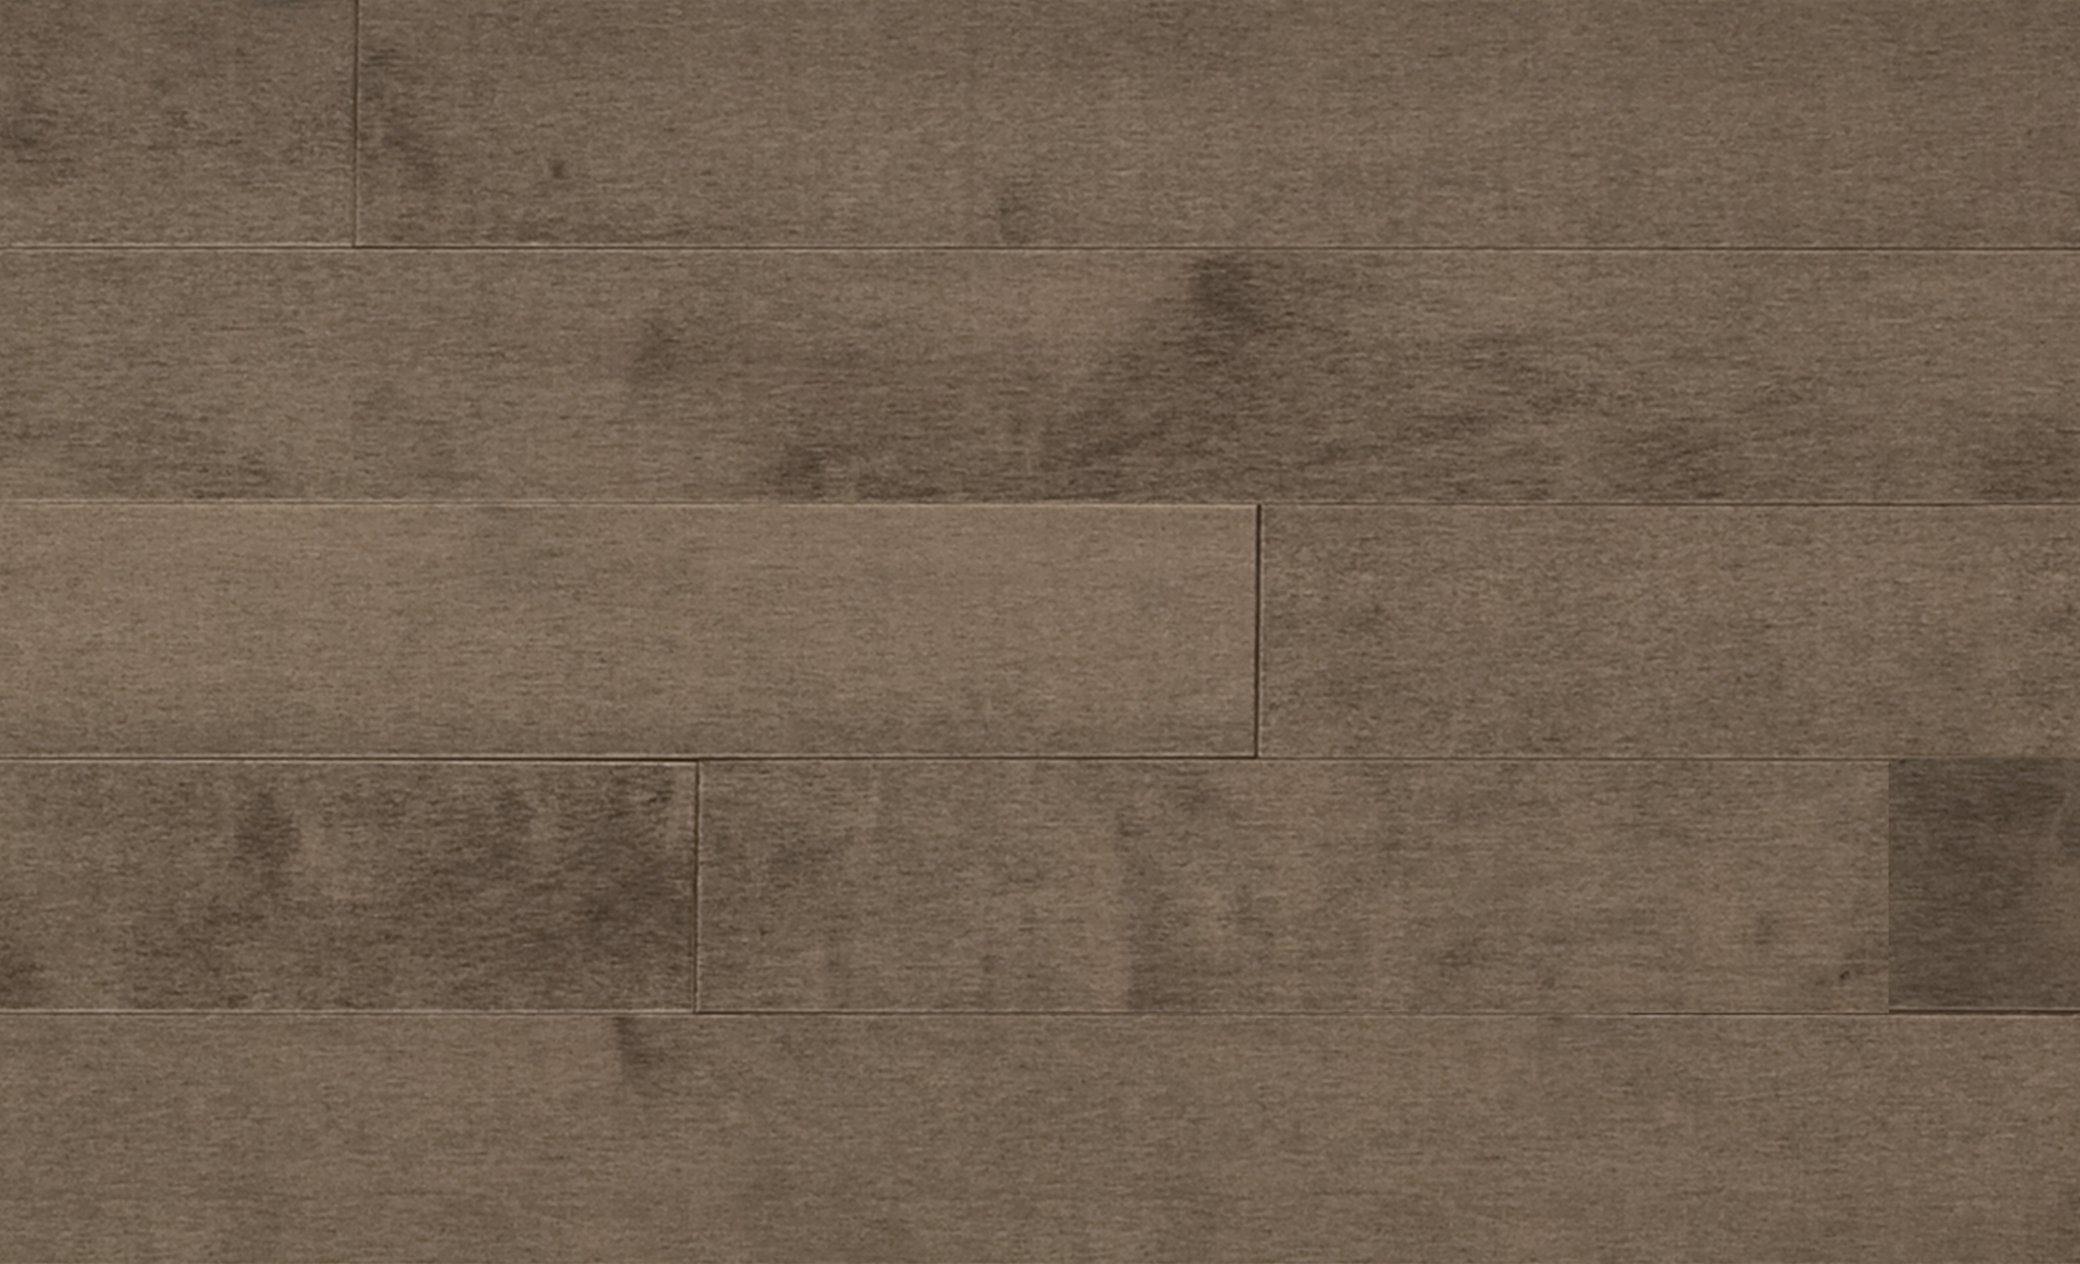 Mercier Design+ Hard Maple Stone Solid: 2 1/4